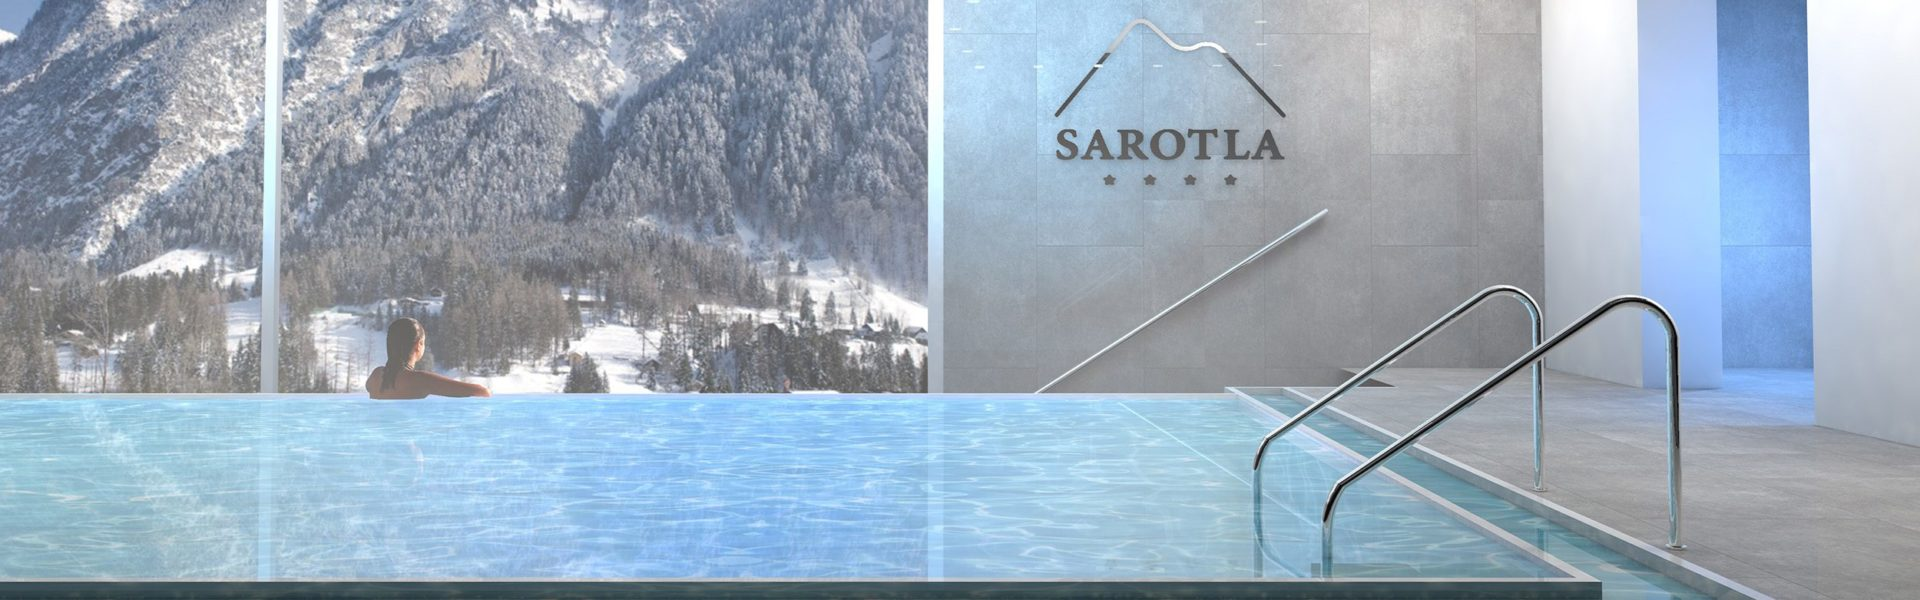 Golfhotel sarotla brand brandnertal for Designhotel vorarlberg